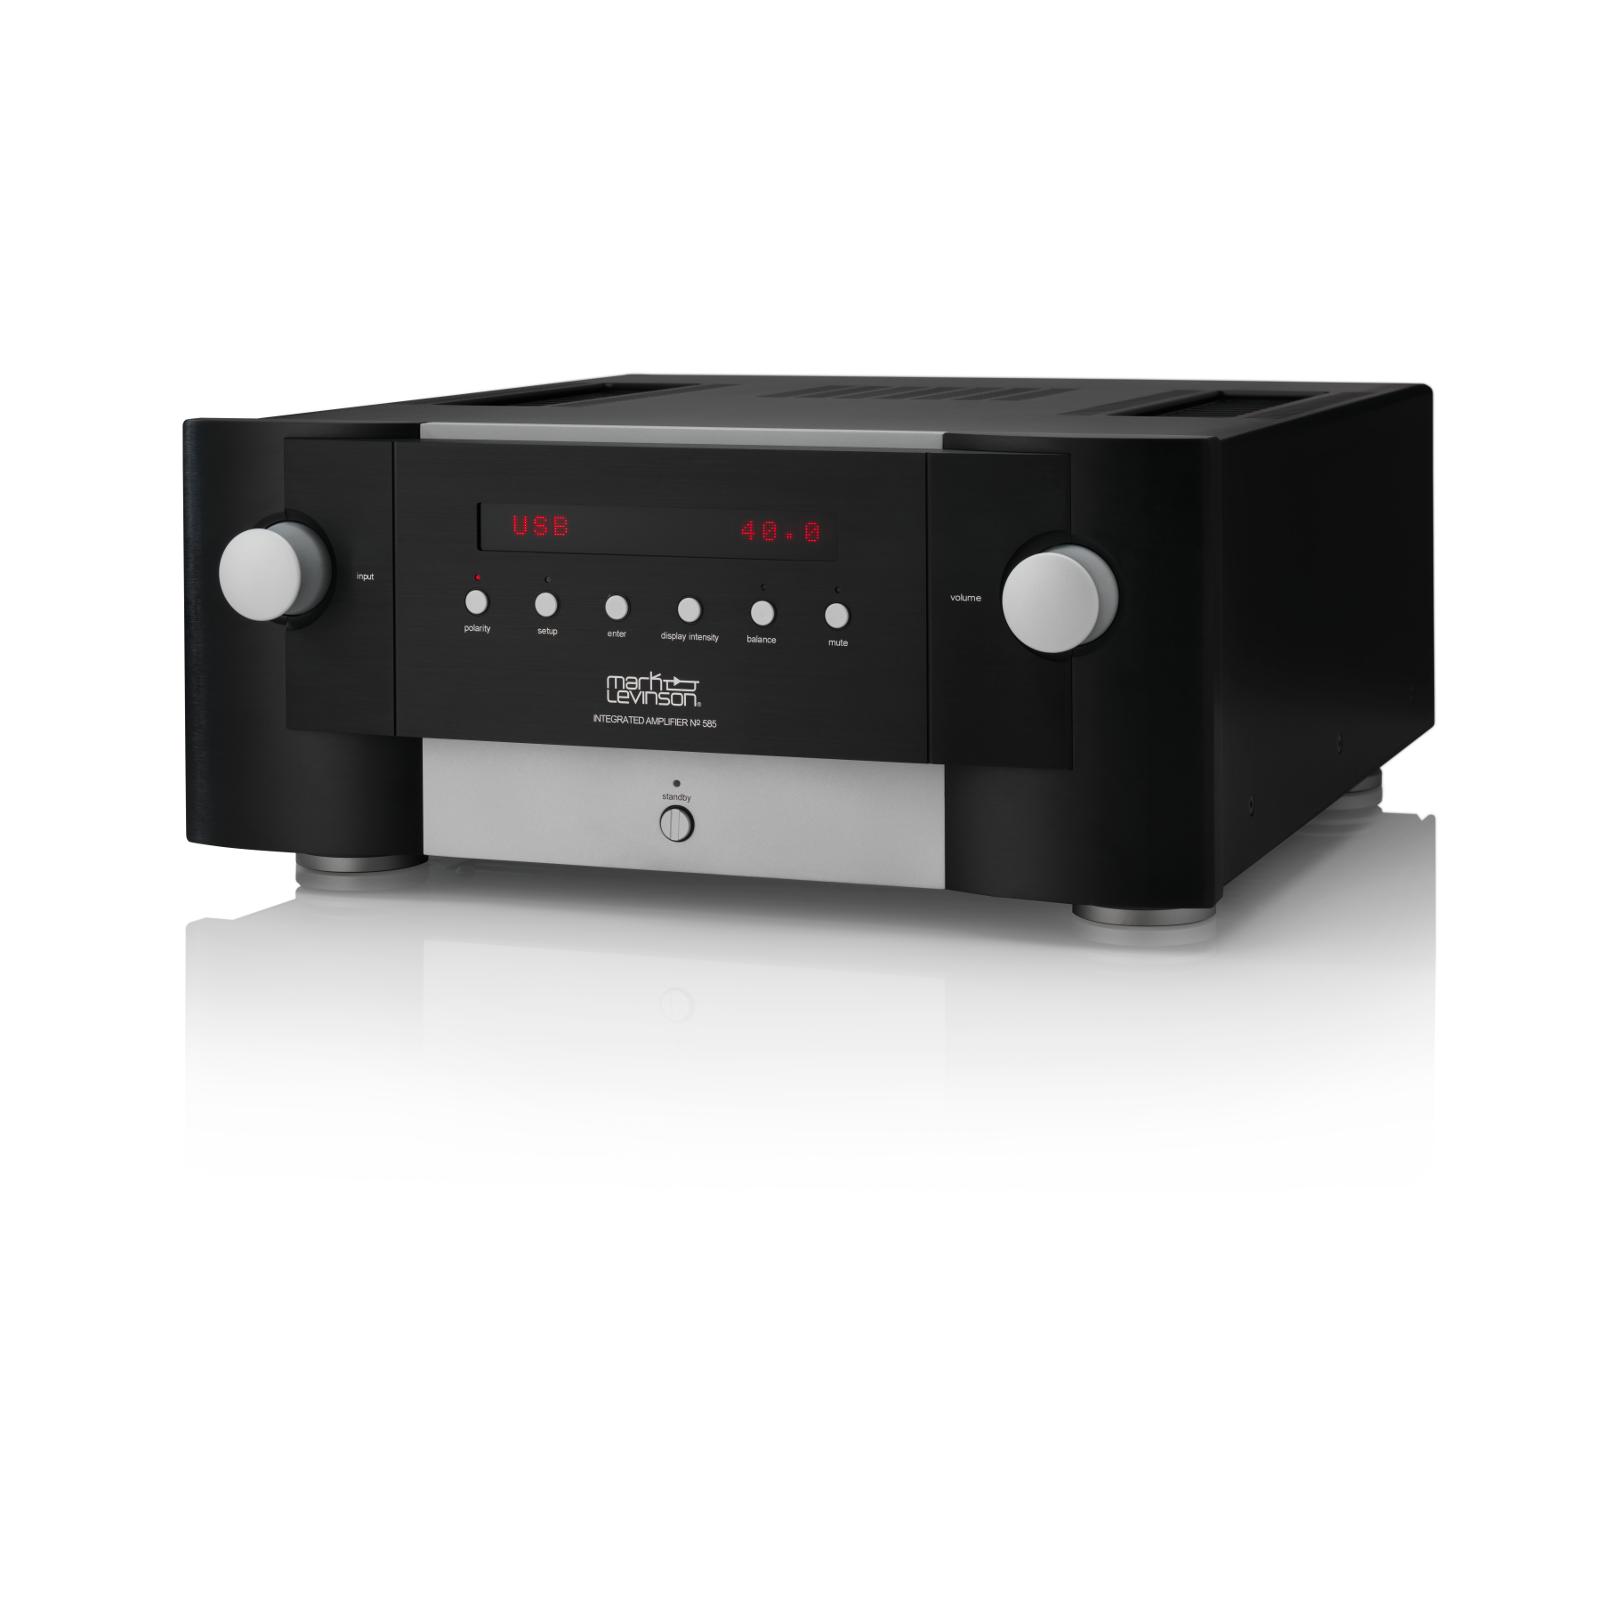 Nº585 - Black - Fully Discrete Integrated Amplifier - Hero